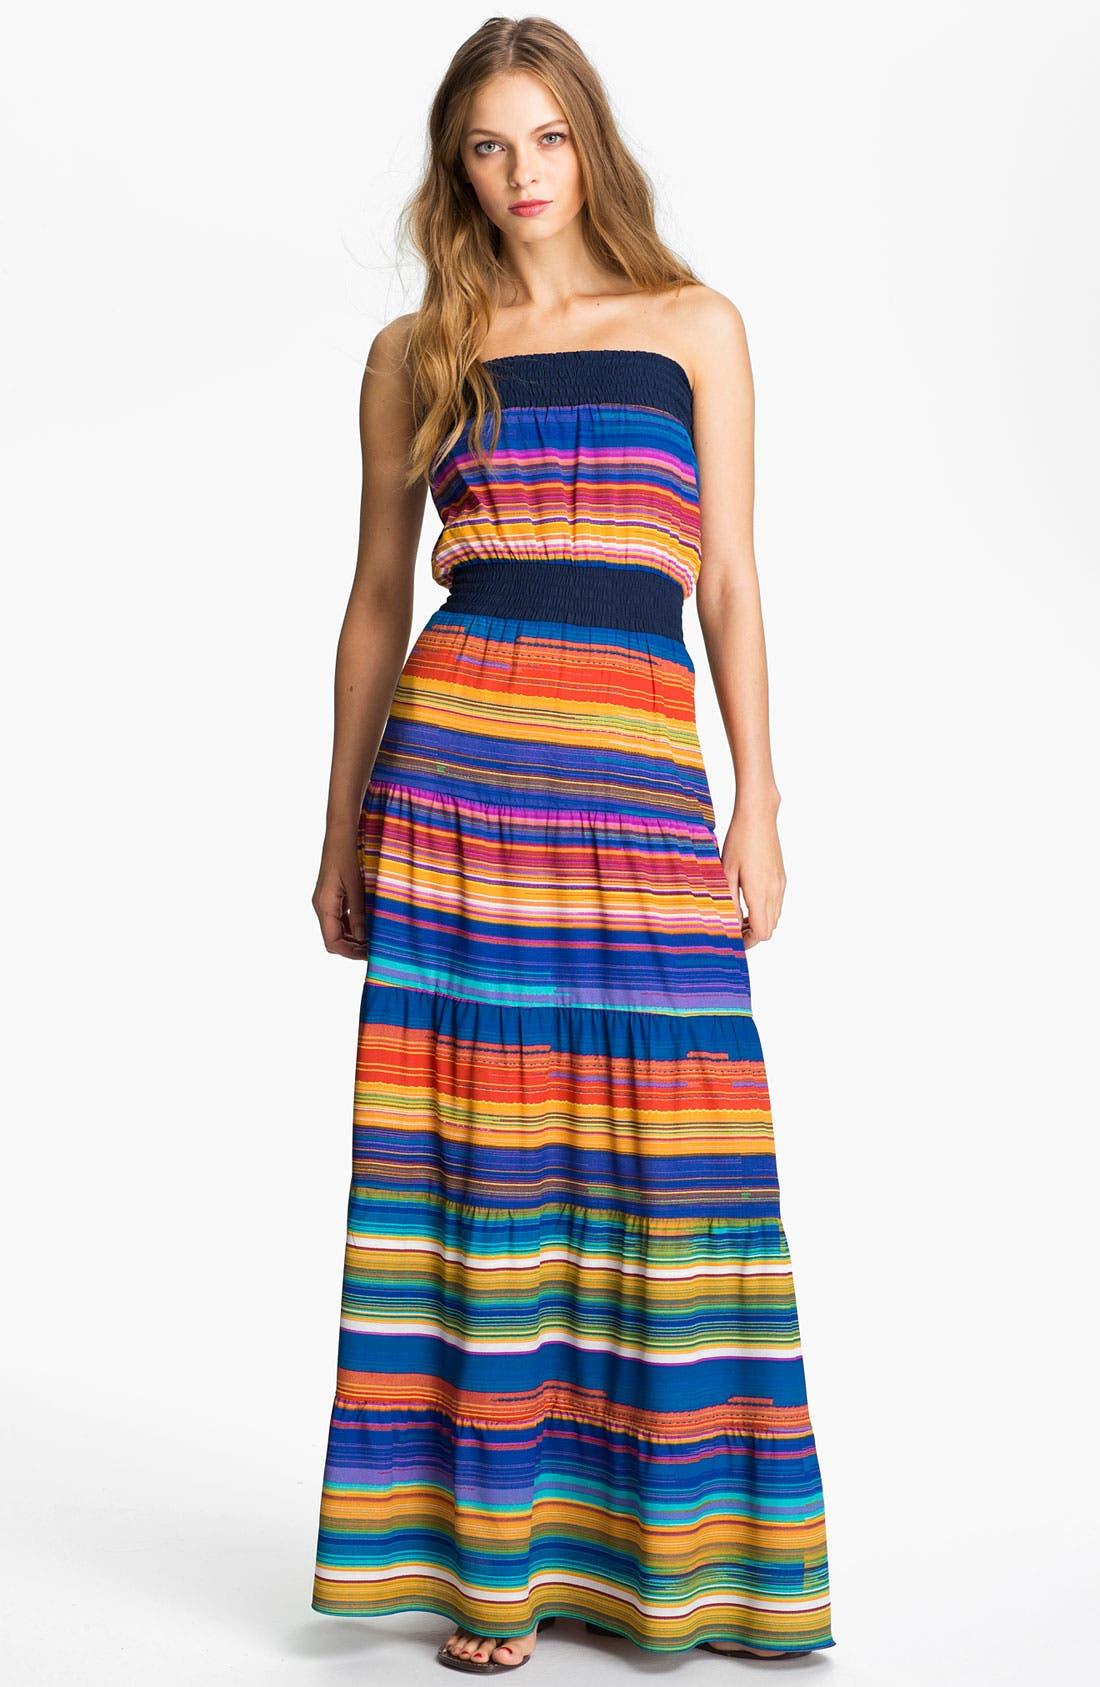 Alternate Image 1 Selected - Tbags Los Angeles Multi Stripe Smocked Prairie Maxi Dress